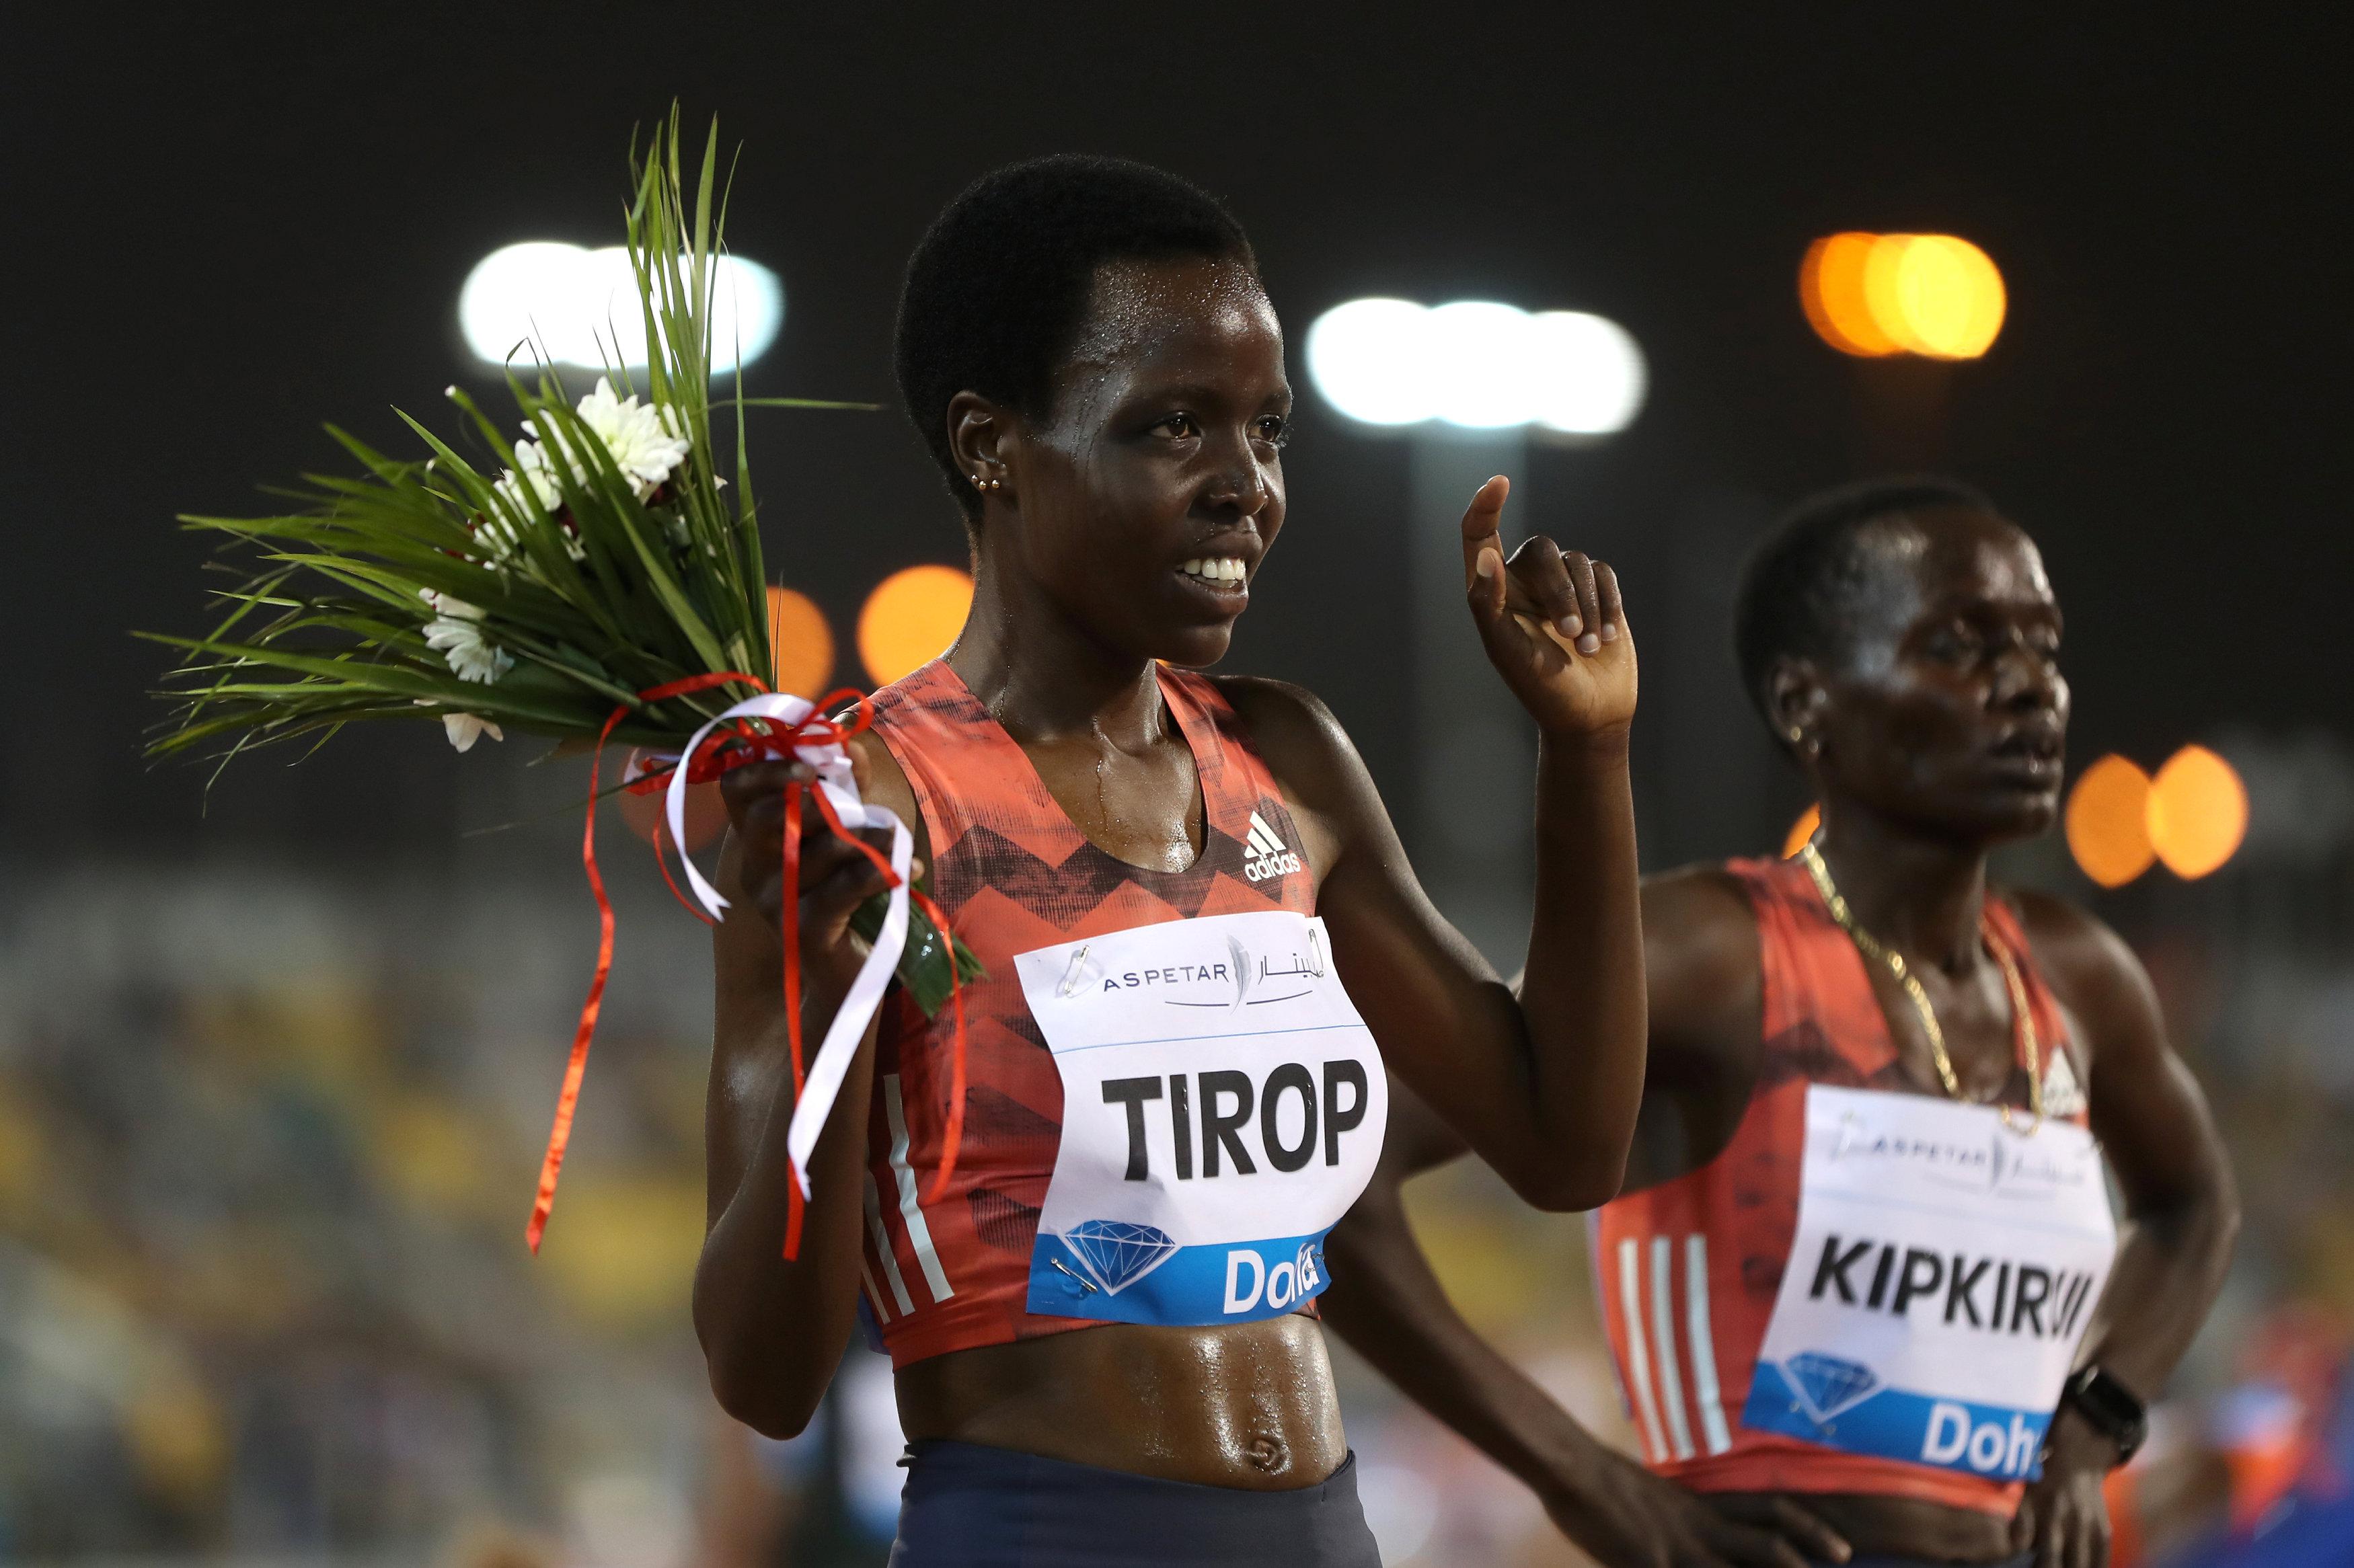 FILE PHOTO-Athletics - Diamond League - Doha - Qatar Sports Club, Doha, Qatar - May 4, 2018   Kenya's Agnes Jebet Tirop celebrates after finishing second in the women's 3000m   REUTERS/Ibraheem Al Omari